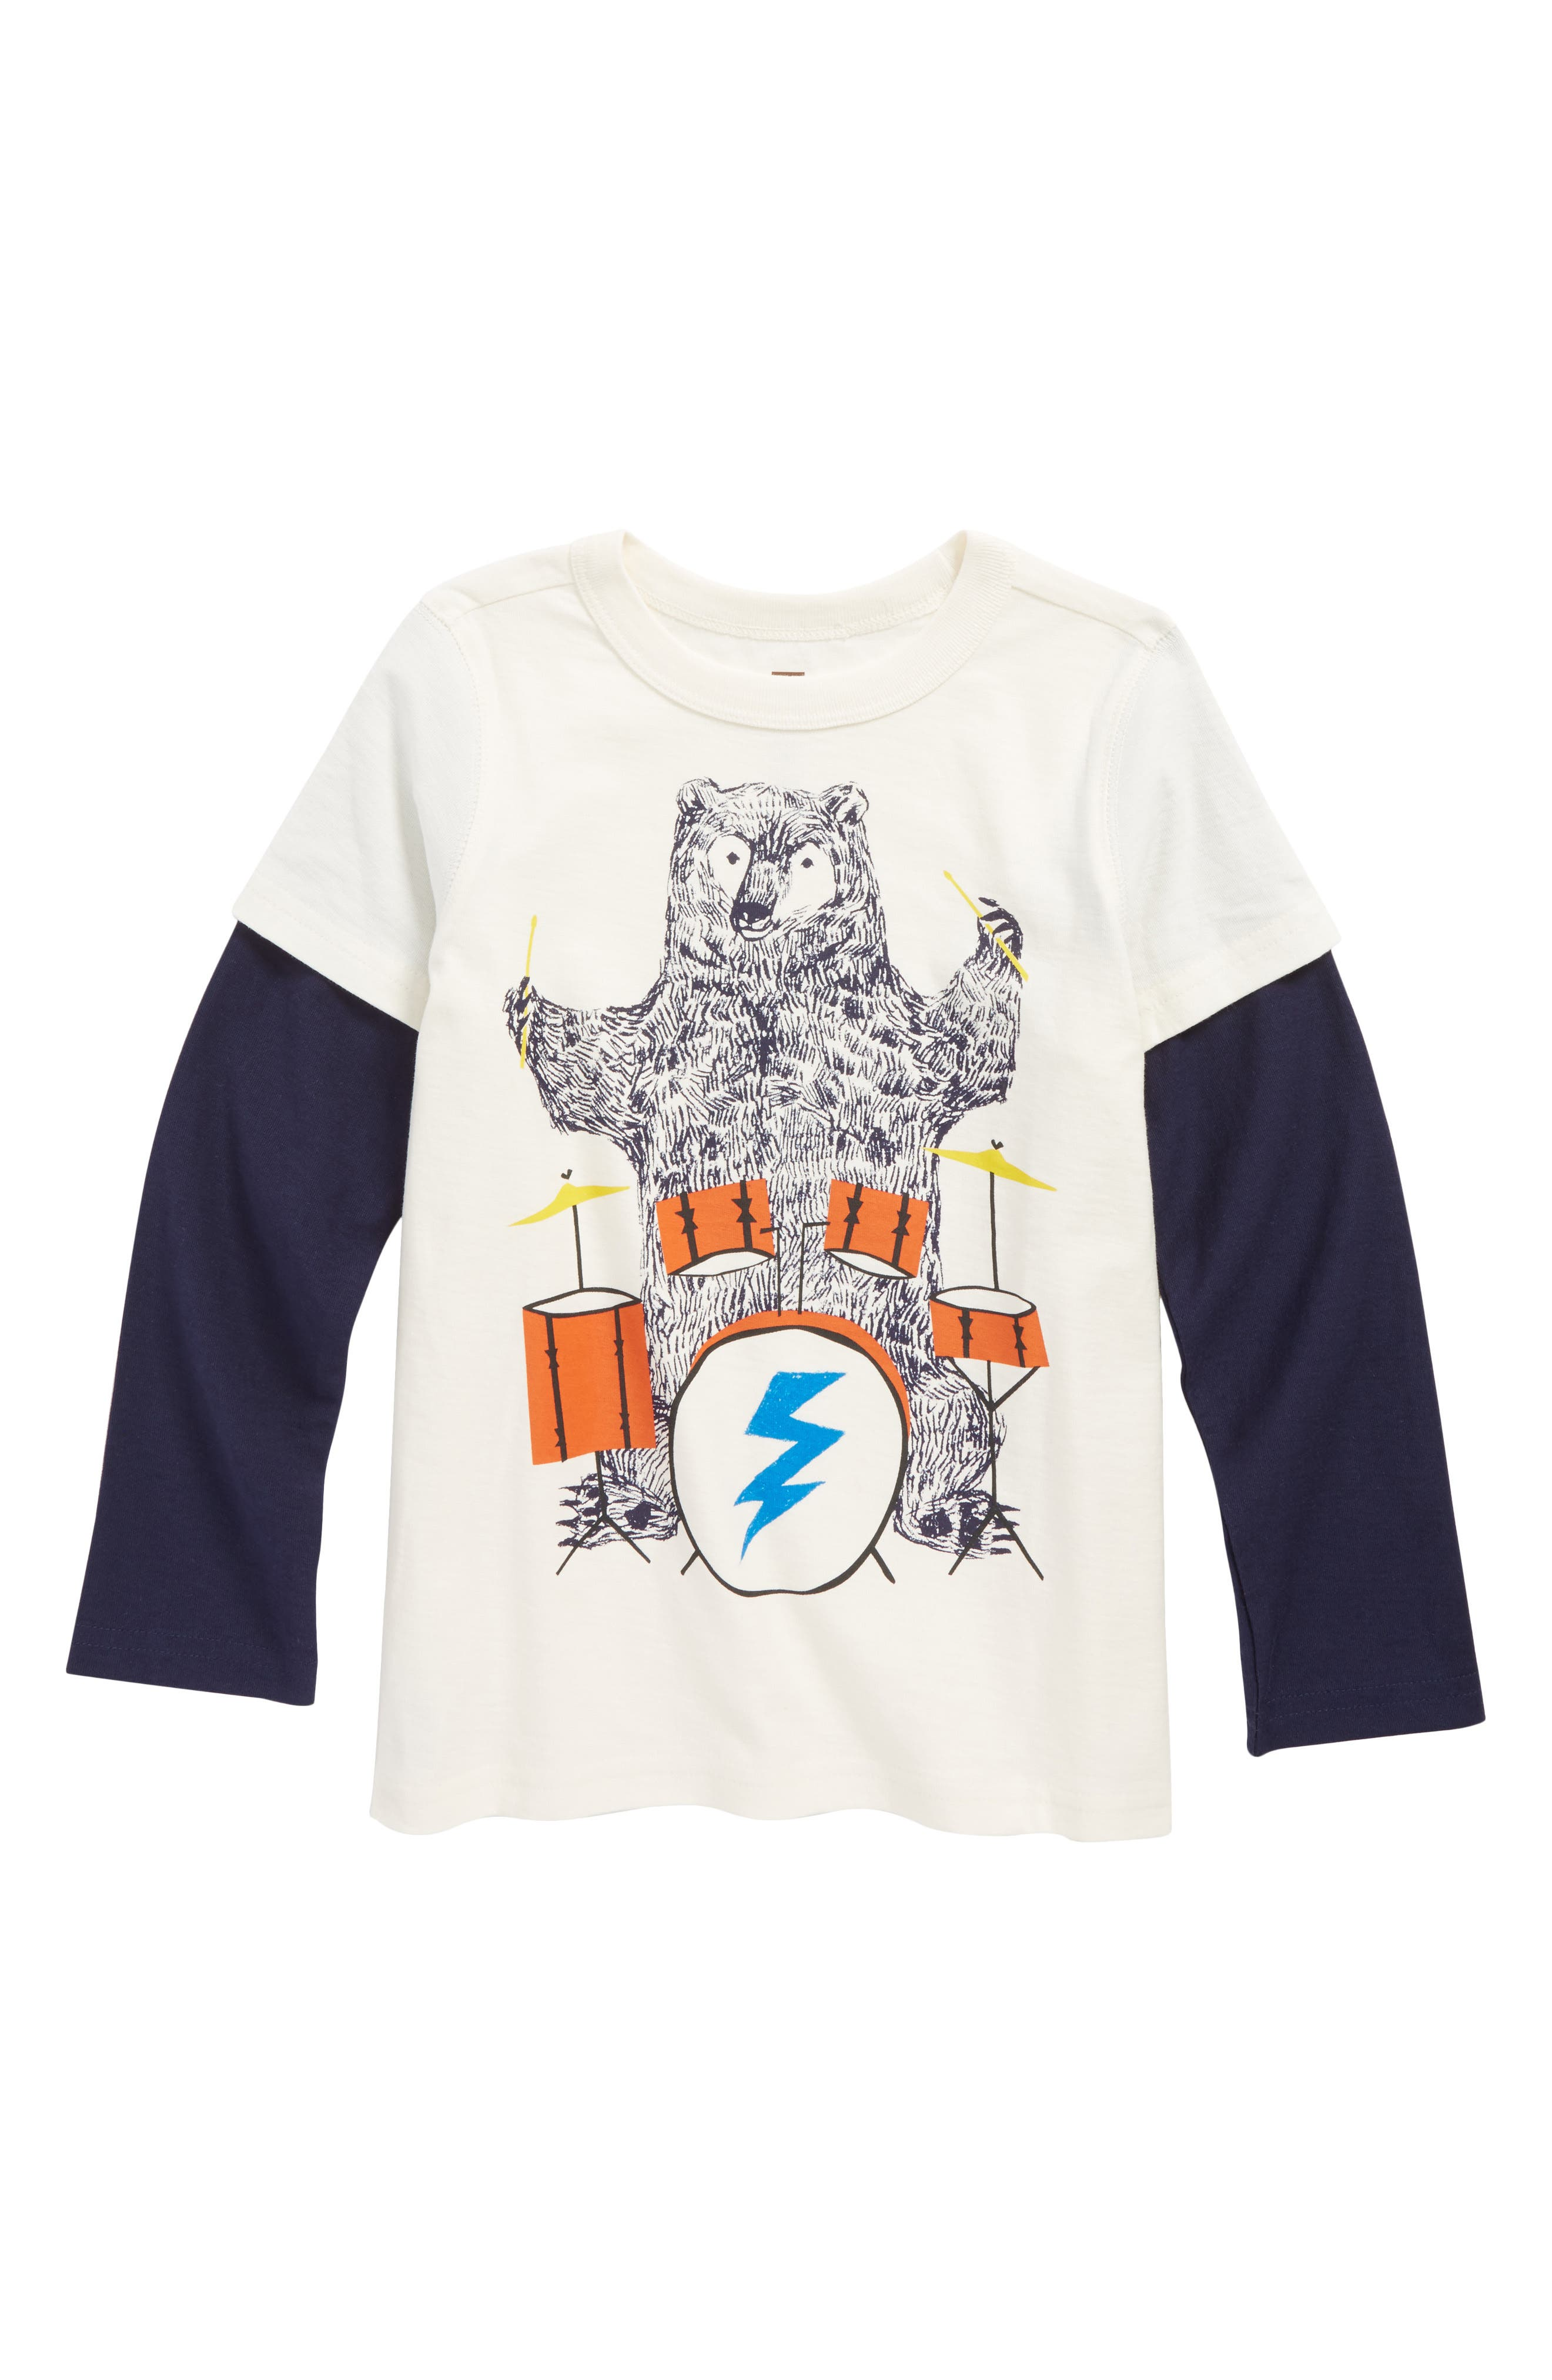 Alternate Image 1 Selected - Tea Collection Backbeat Bear Layer T-Shirt (Toddler Boys & Little Boys)